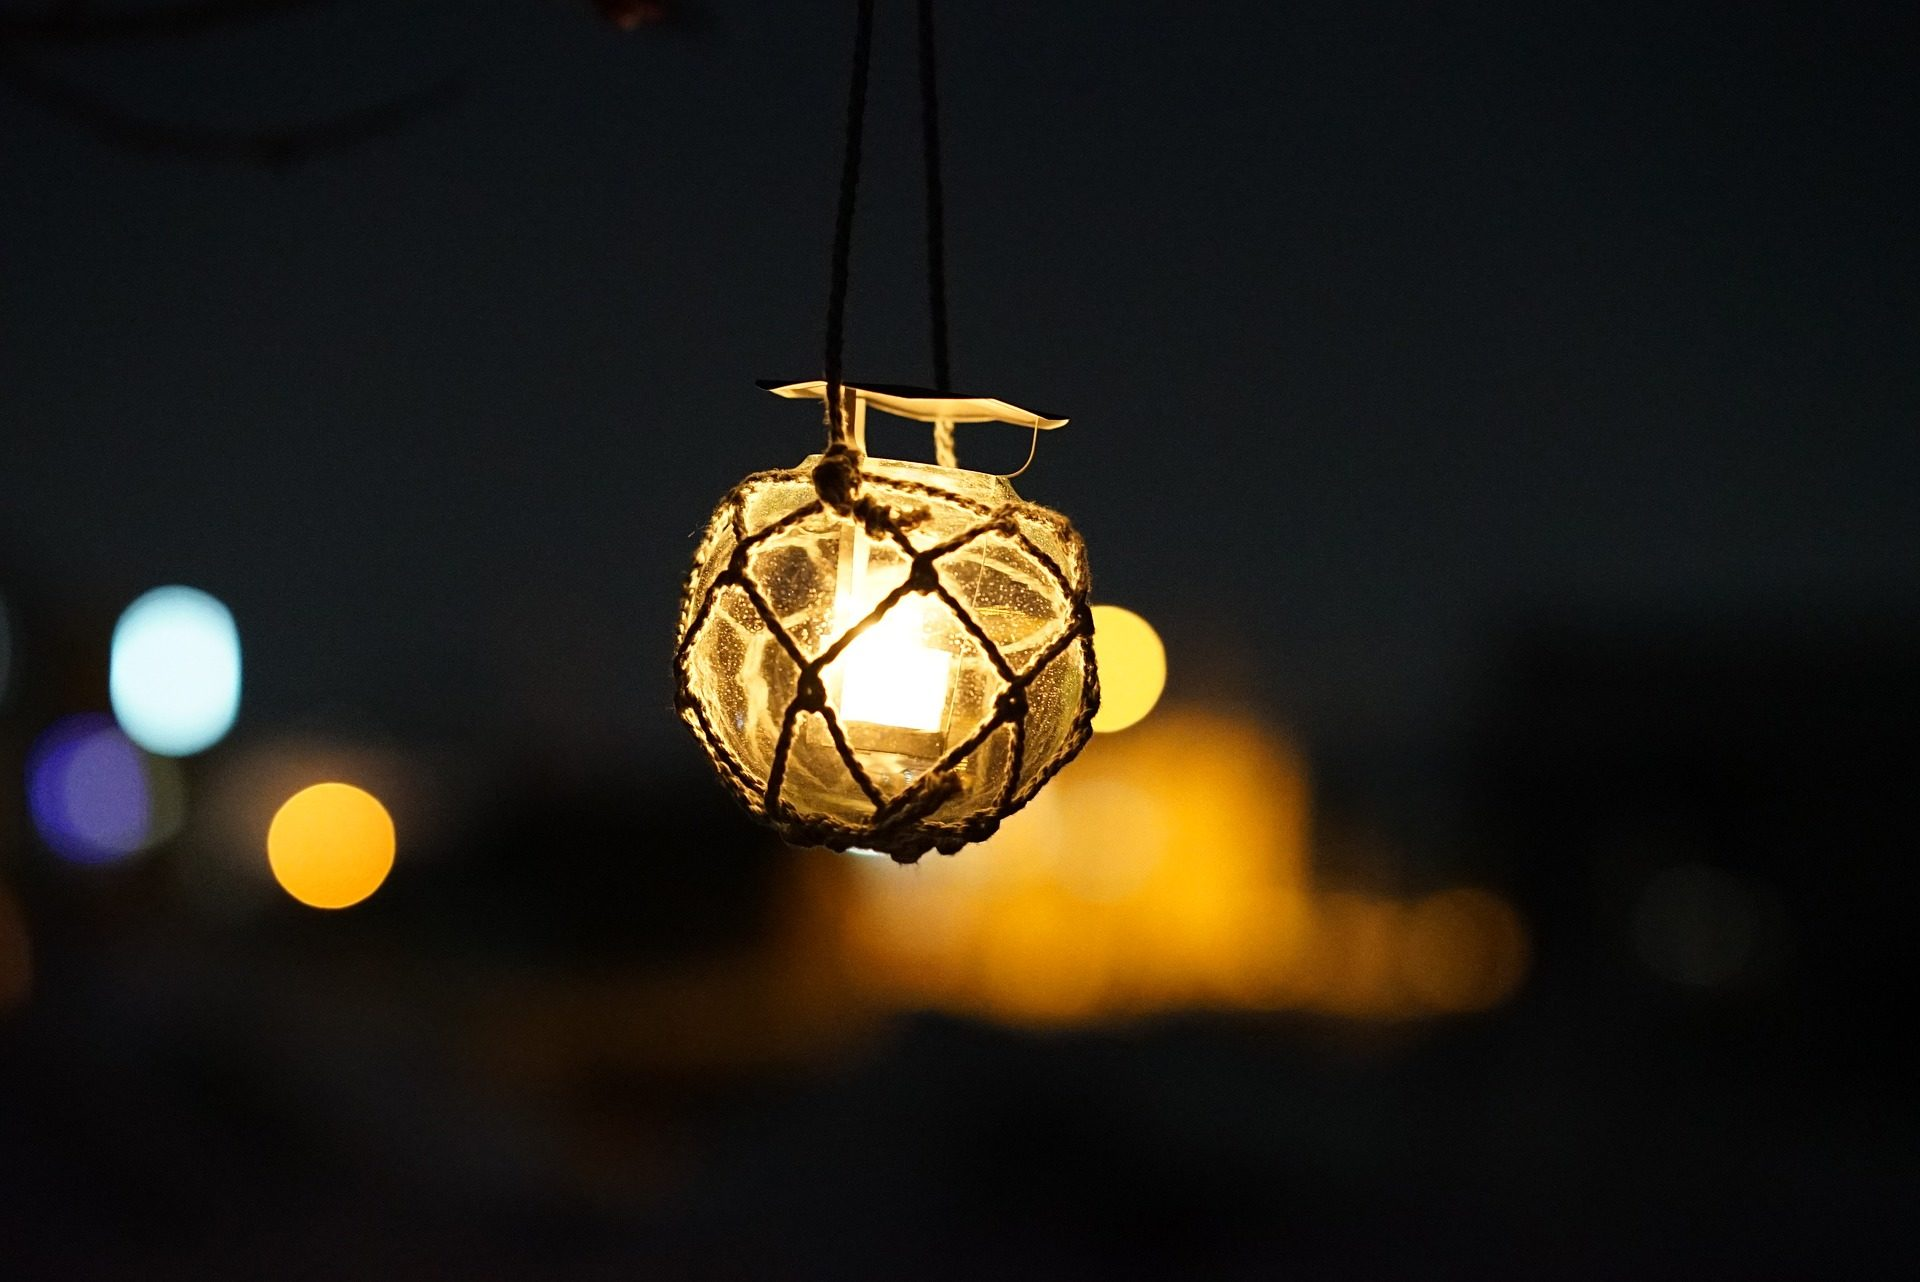 بالصور فوانيس رمضان 2019 , صور لاجمل فوانيس رمضان 2019 5866 9